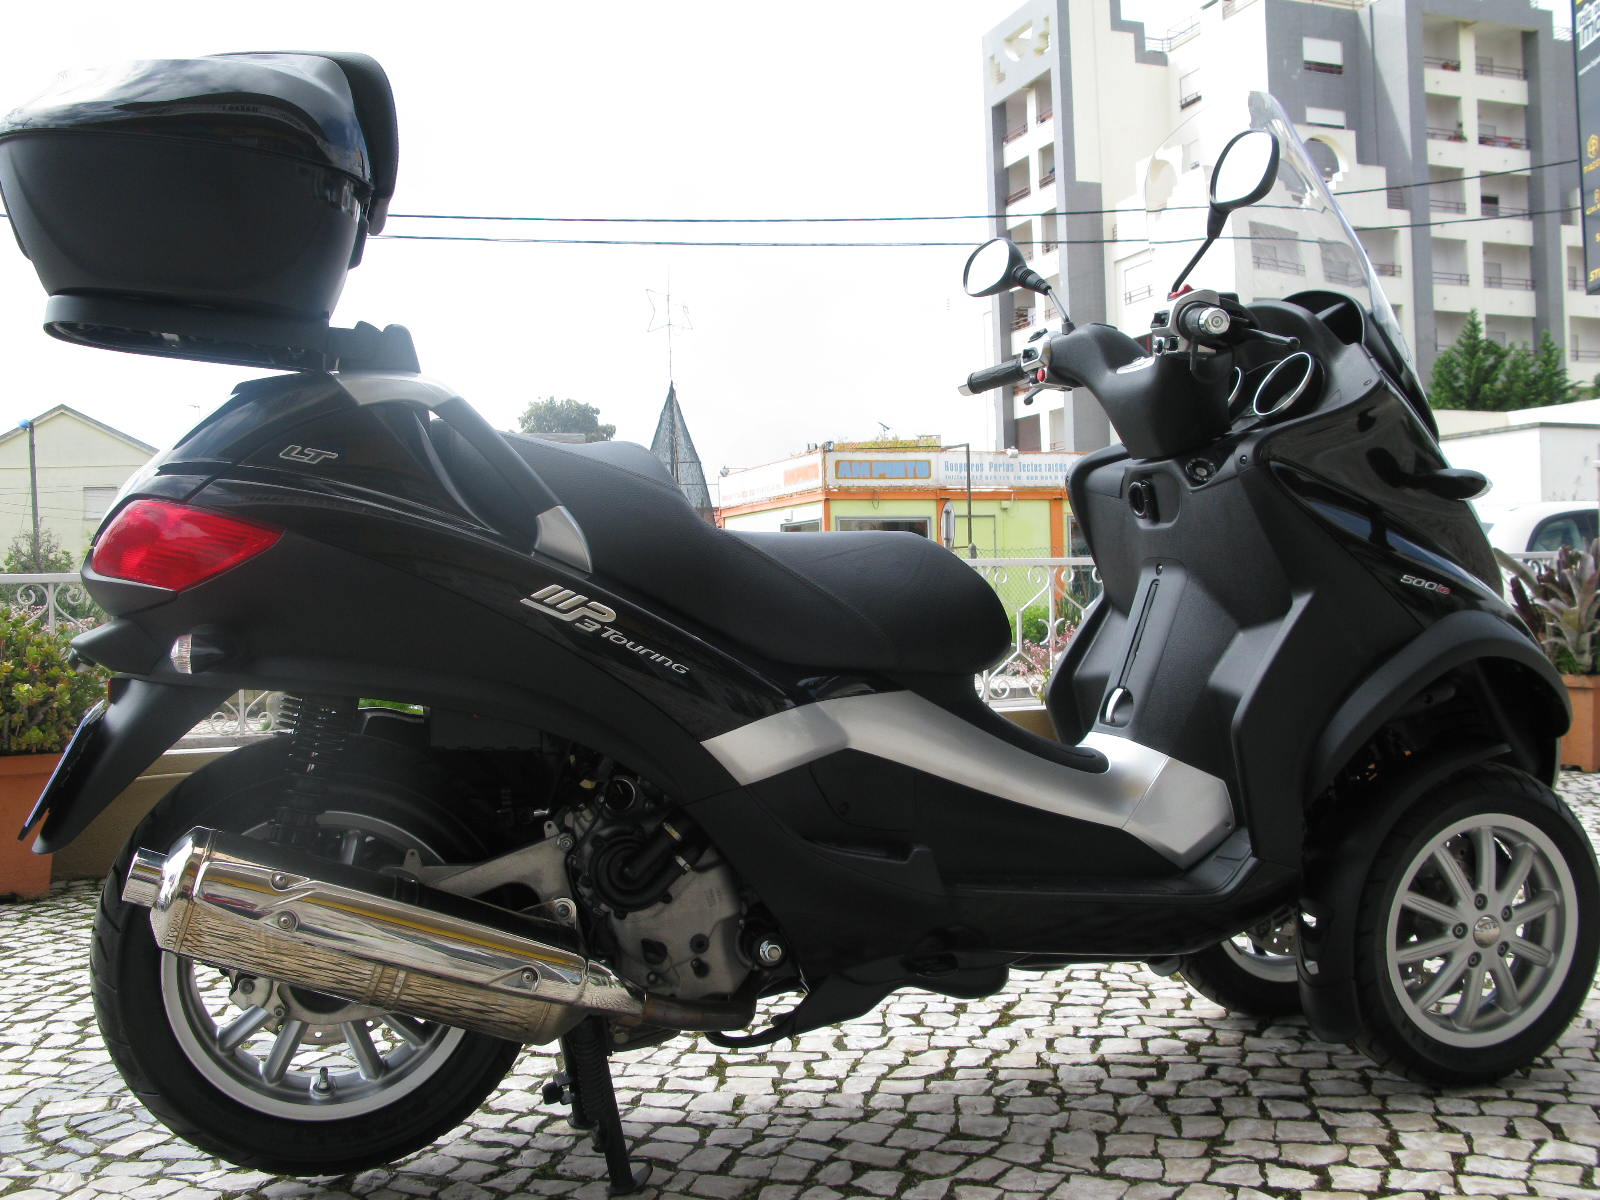 loja das motos piaggio mp3 500 lt usada. Black Bedroom Furniture Sets. Home Design Ideas